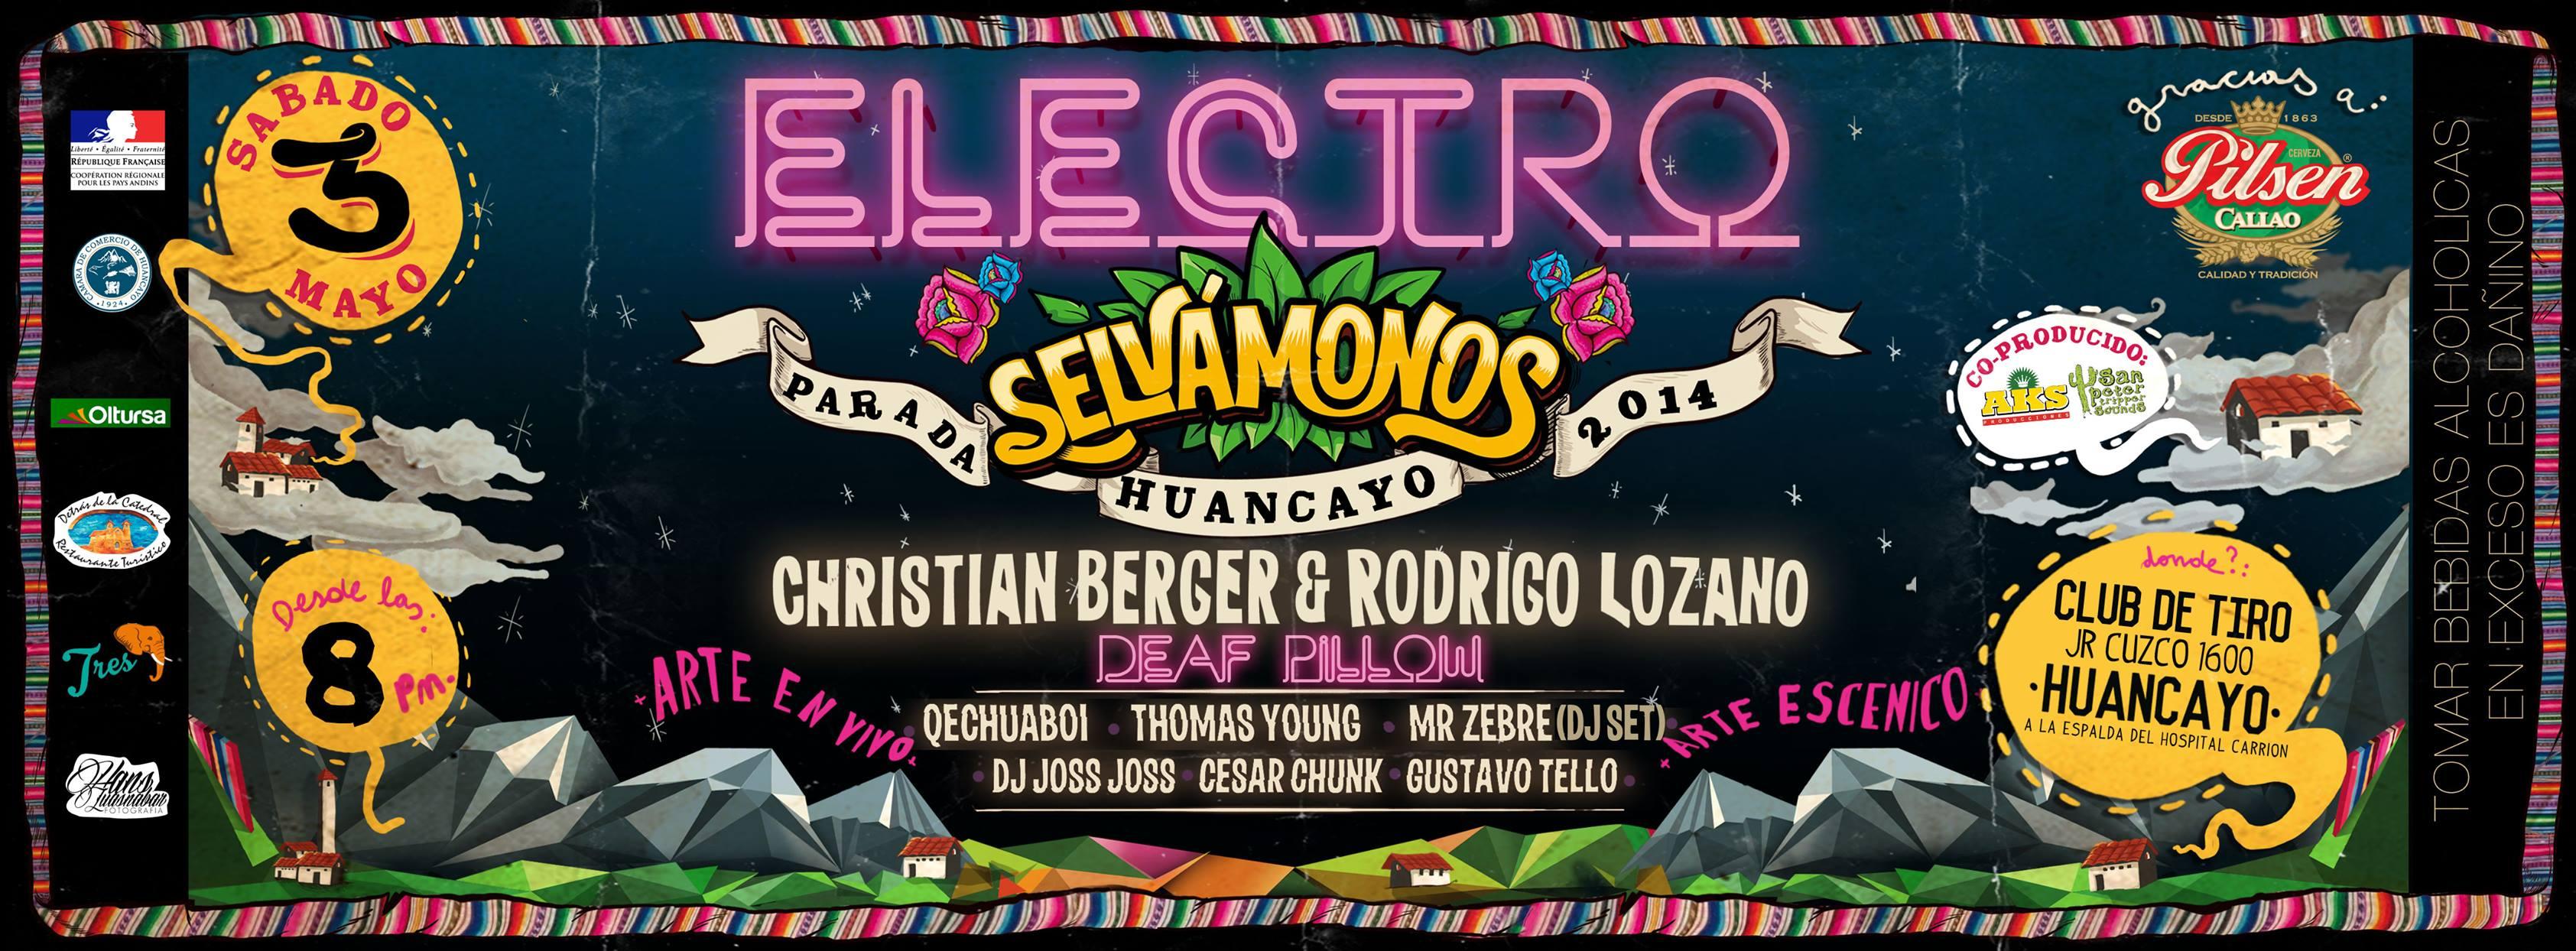 ELECTRO HUANCAYO